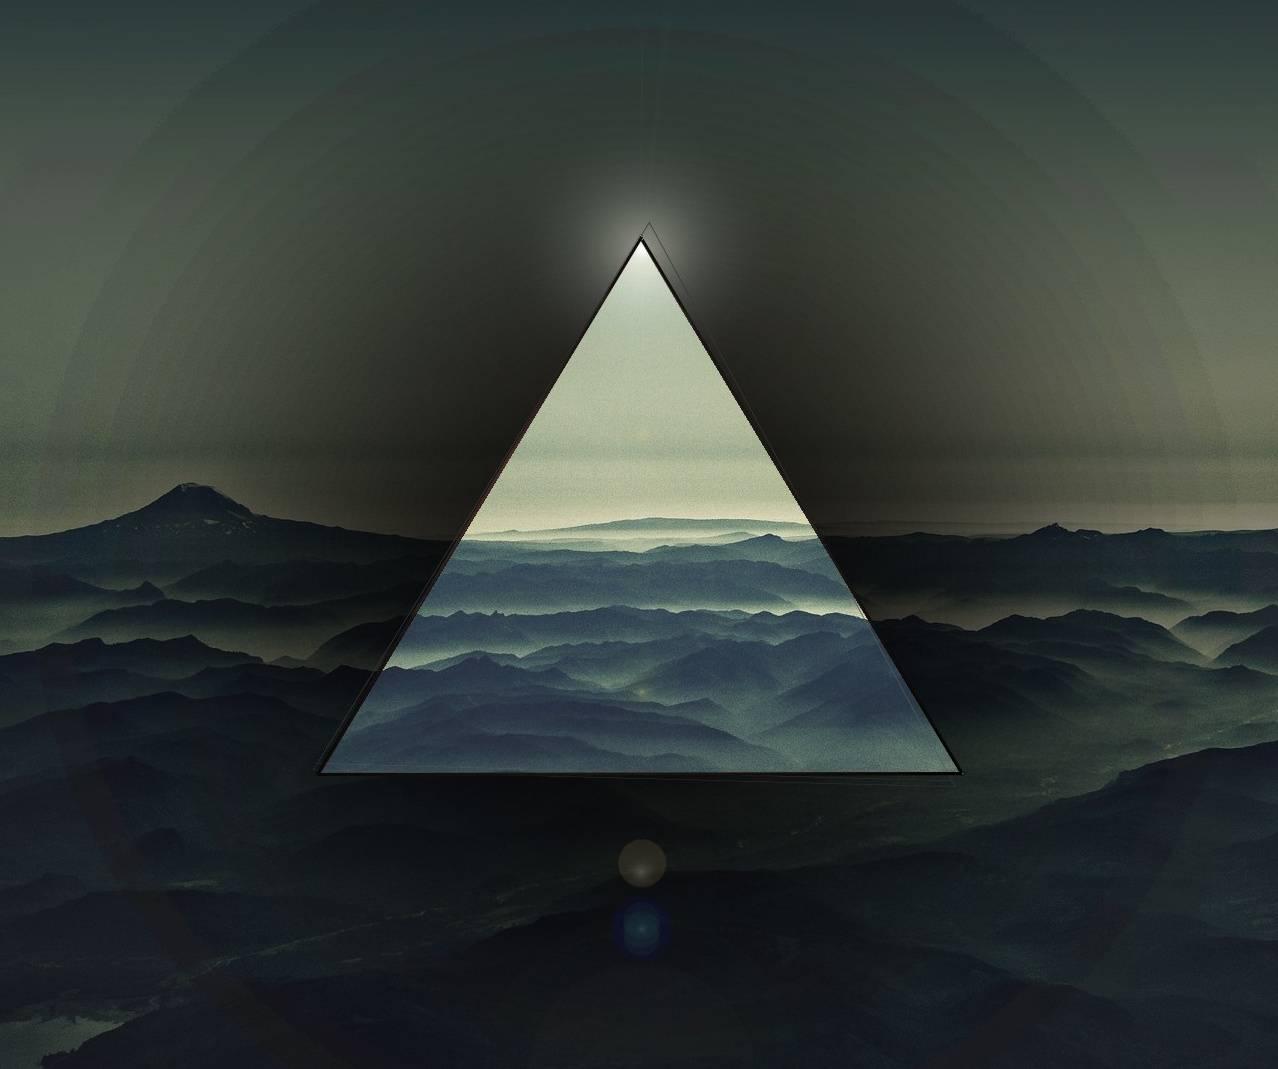 Triangle - Triangulo